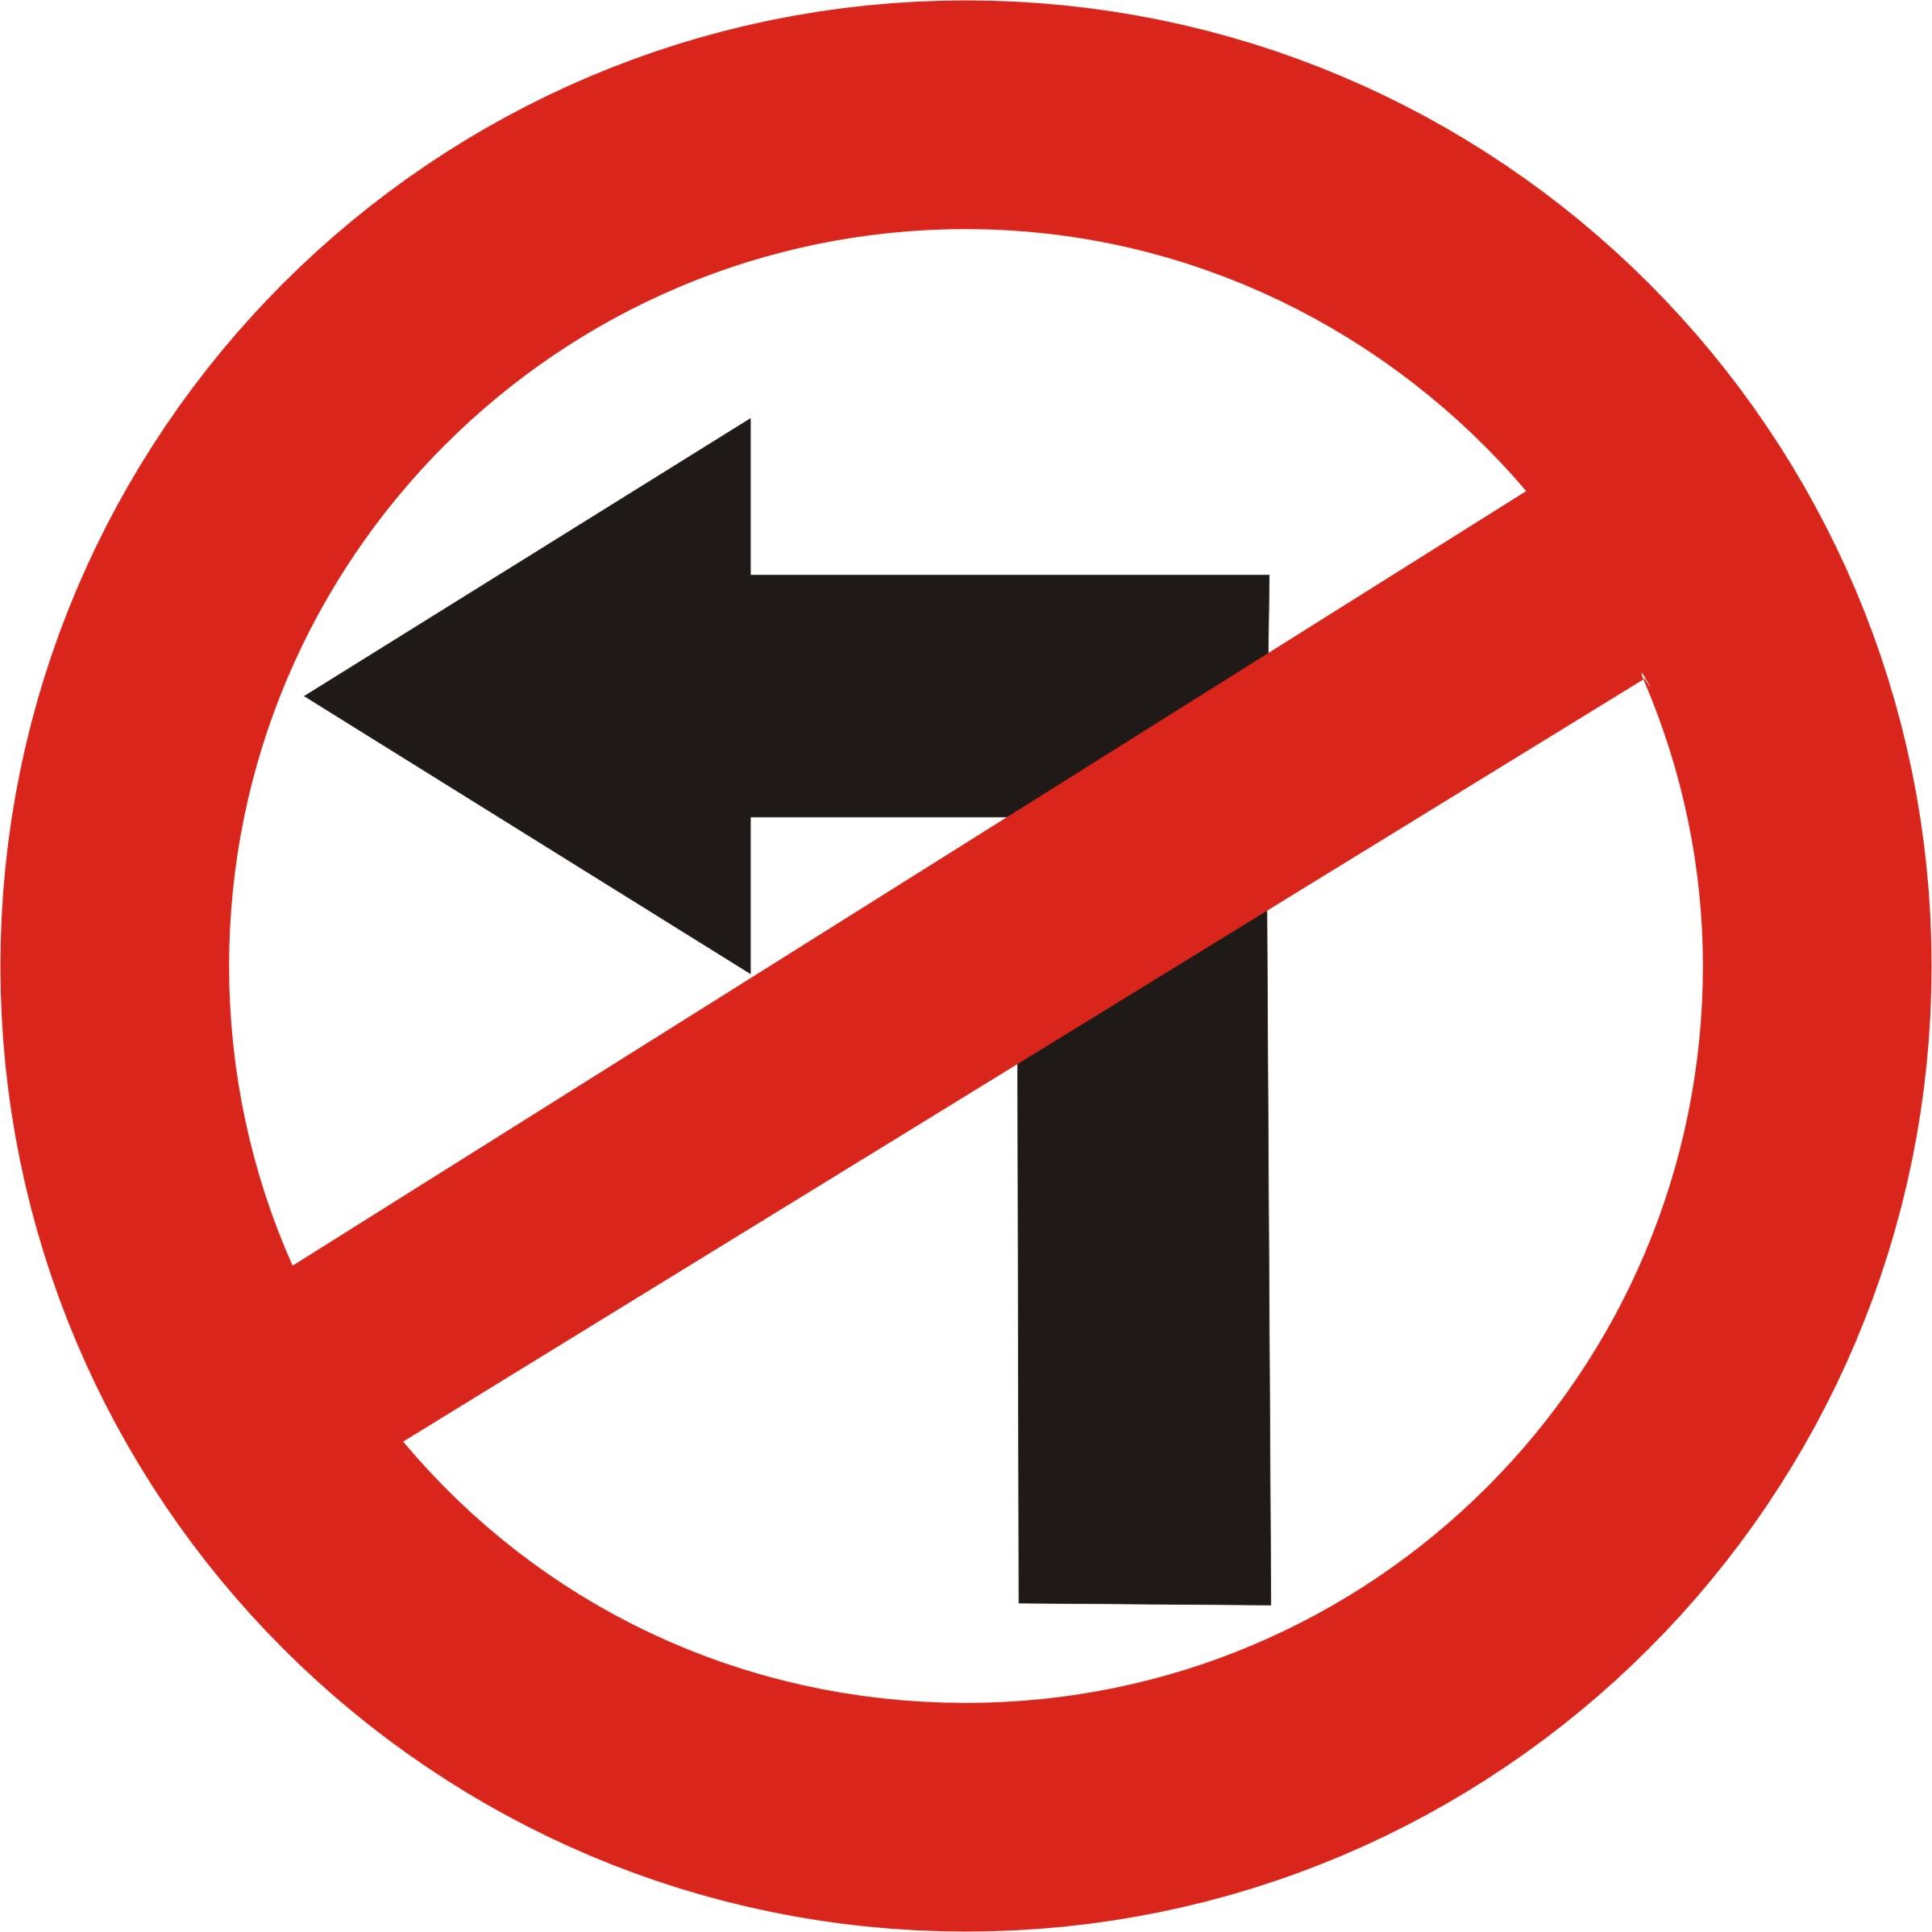 Road Sign No Left Turn.jpg.